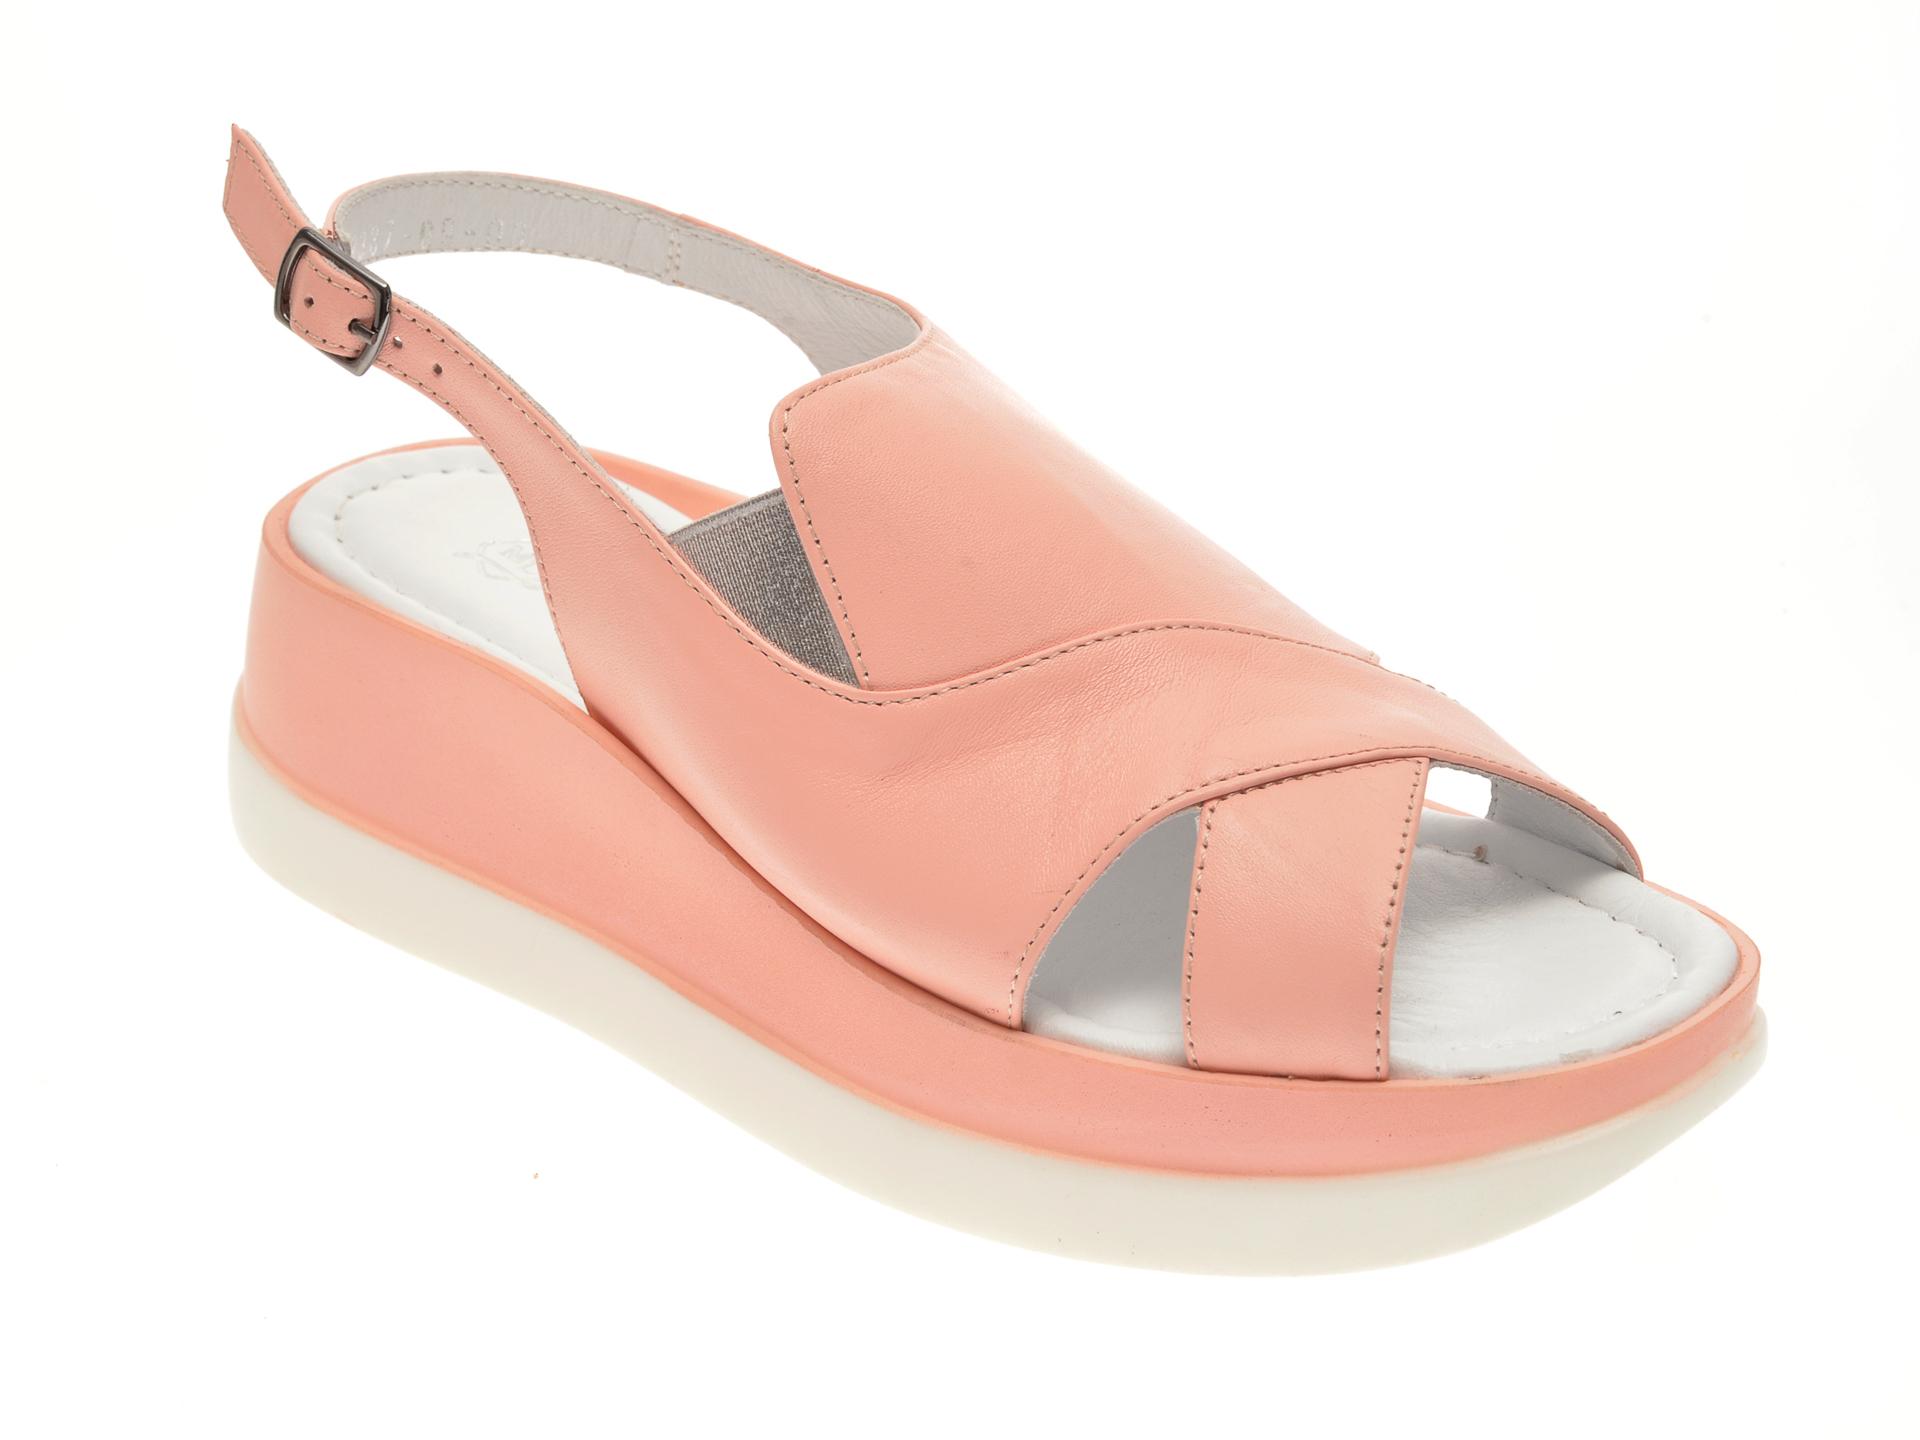 Sandale MISS LIZA roz, 1182387, din piele naturala New